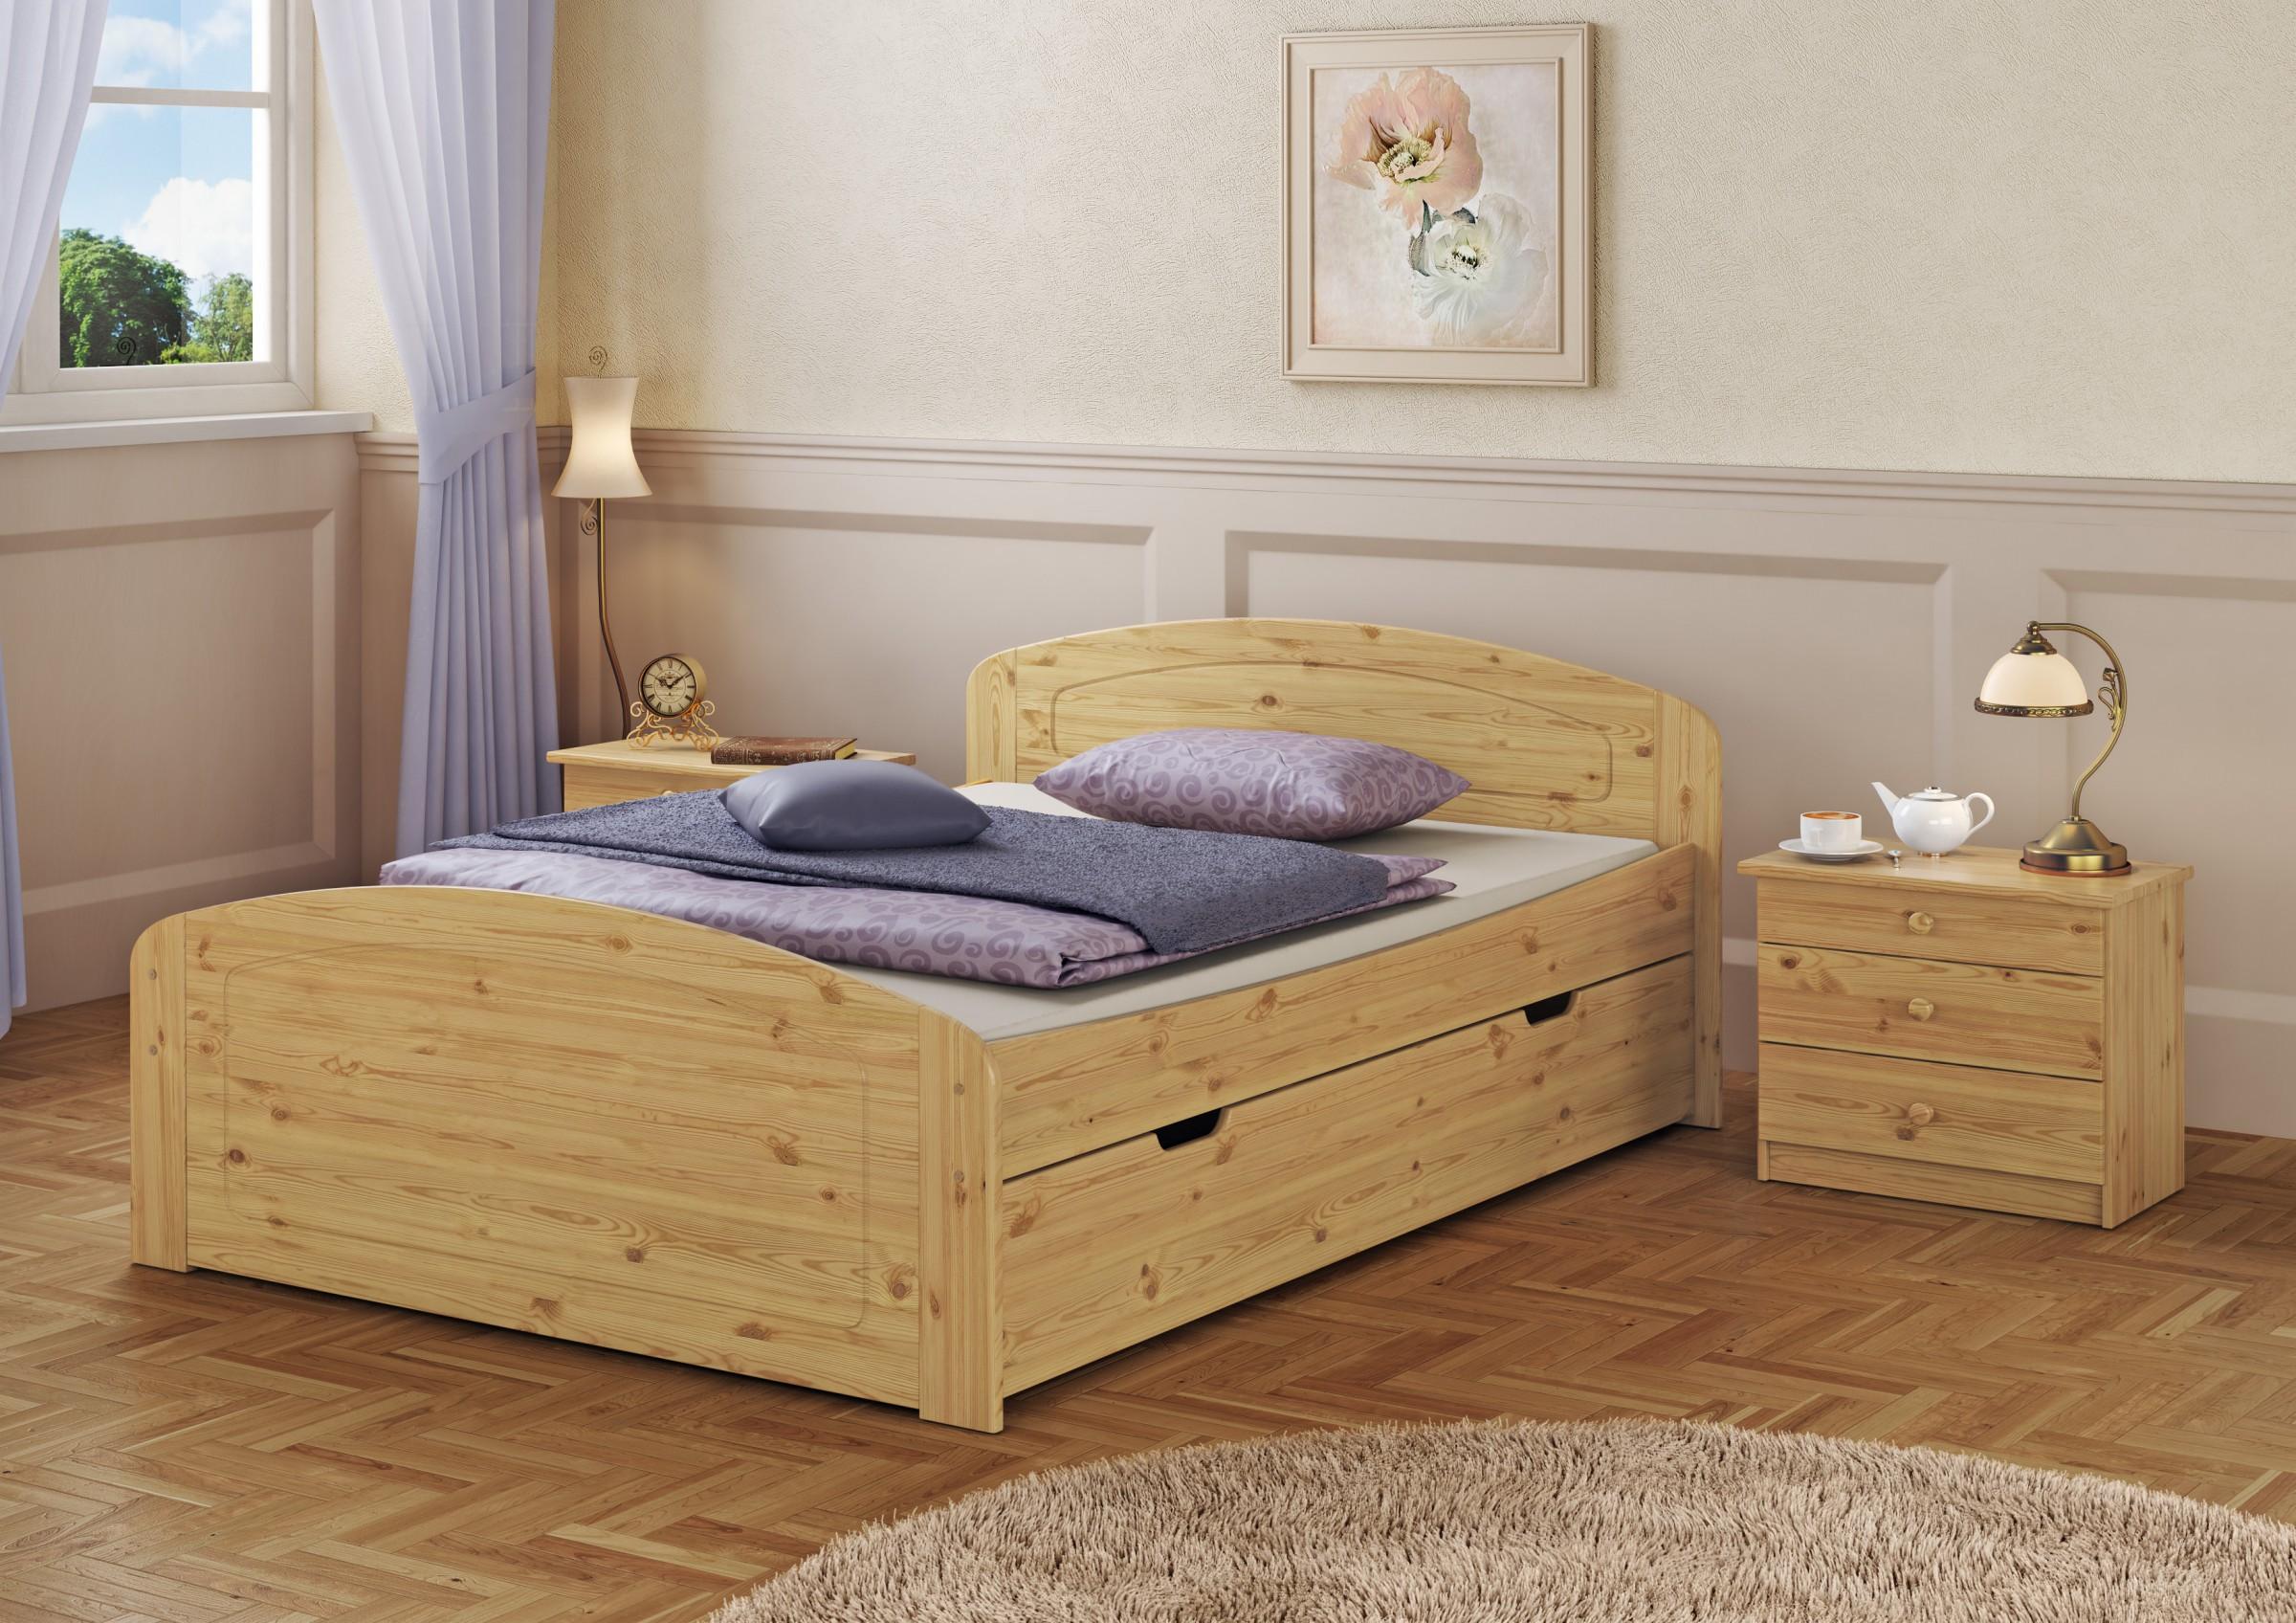 doppelbett 3 bettkasten federholzrahmen 140x200. Black Bedroom Furniture Sets. Home Design Ideas